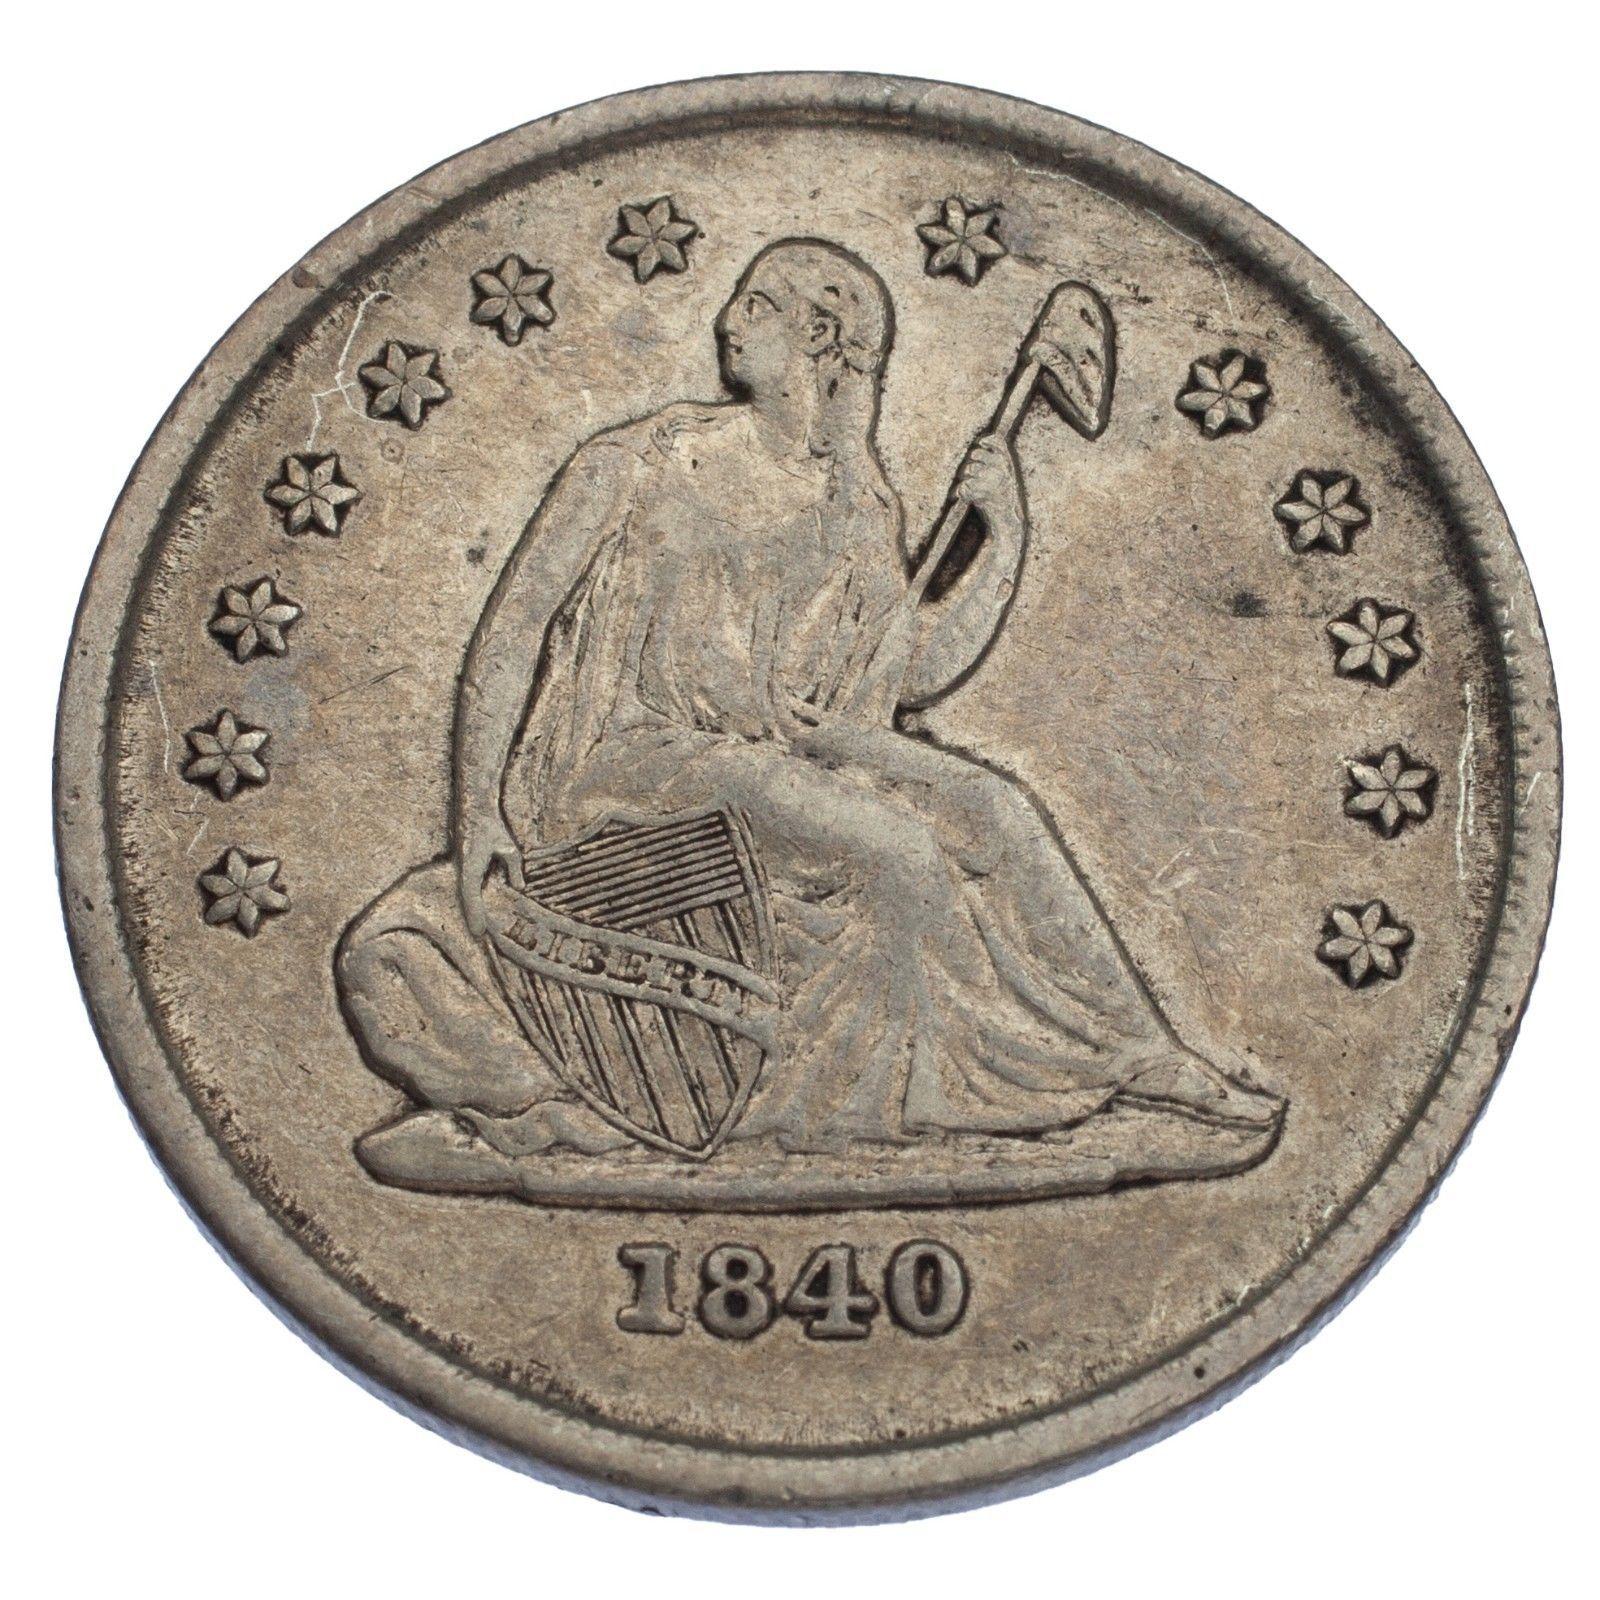 1840-O No Drapery Liberty Seated Quarter 25C (Very Fine, VF Condition)